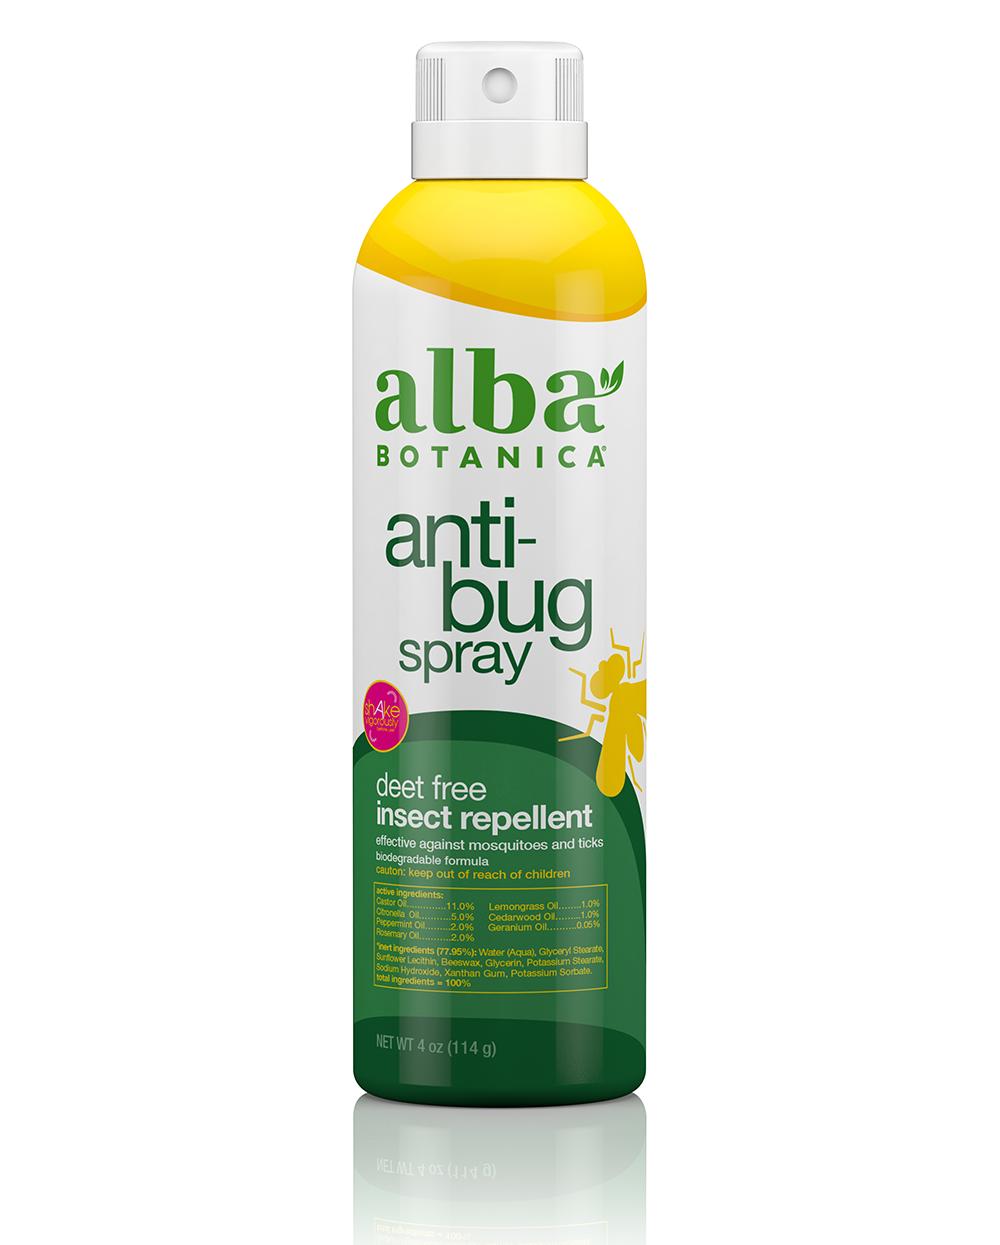 anti-bug spray